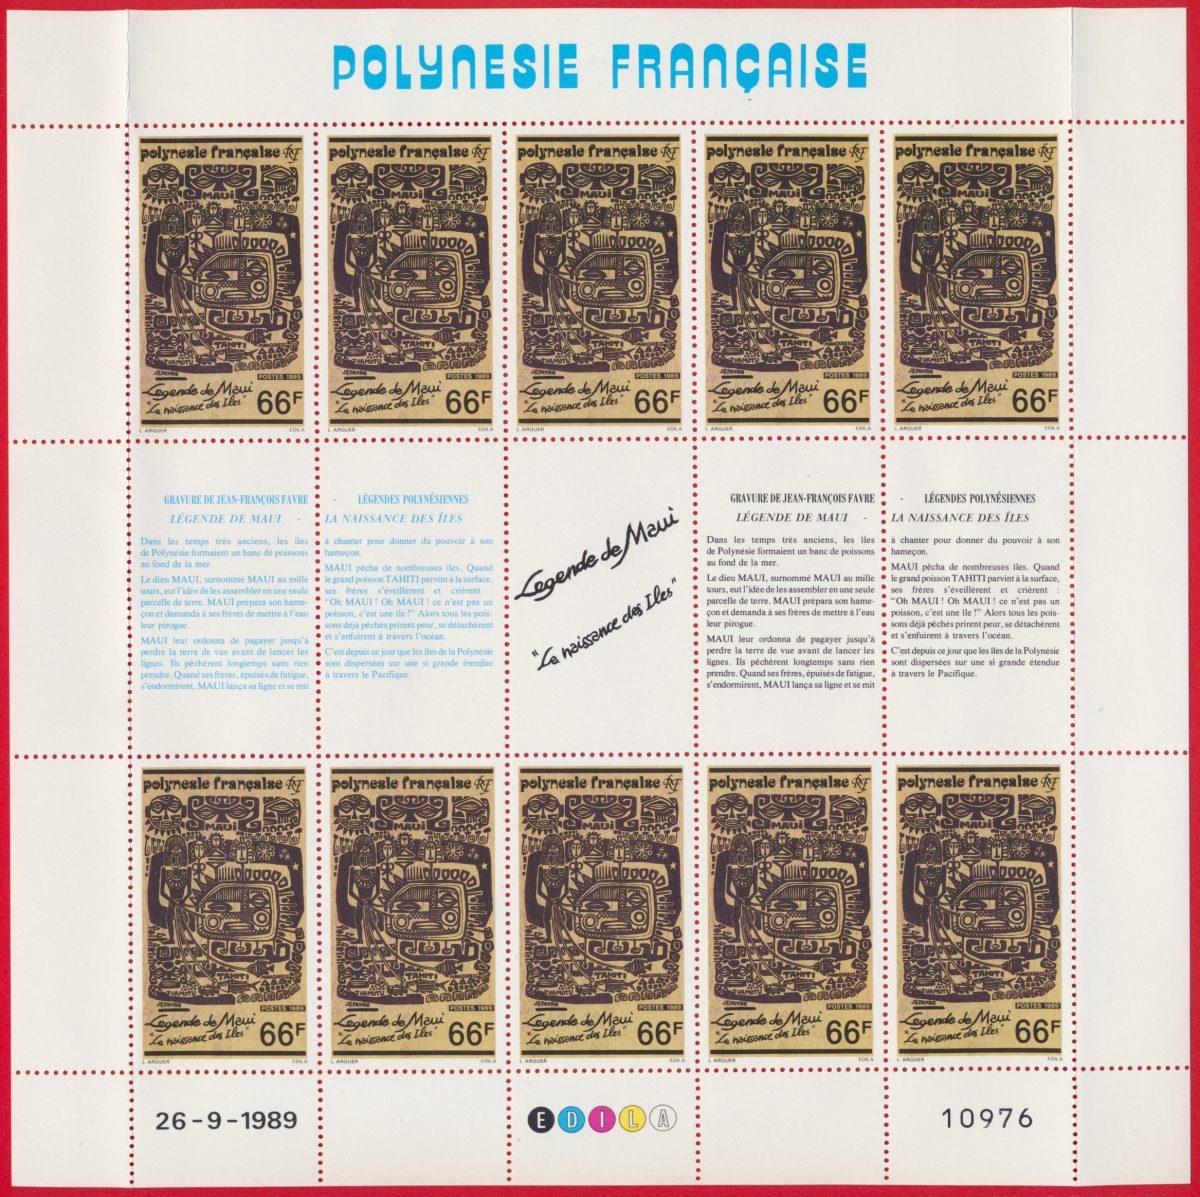 bloc-polynesie-francaise-26-9-1989-66-francs-legende-naissance-iles